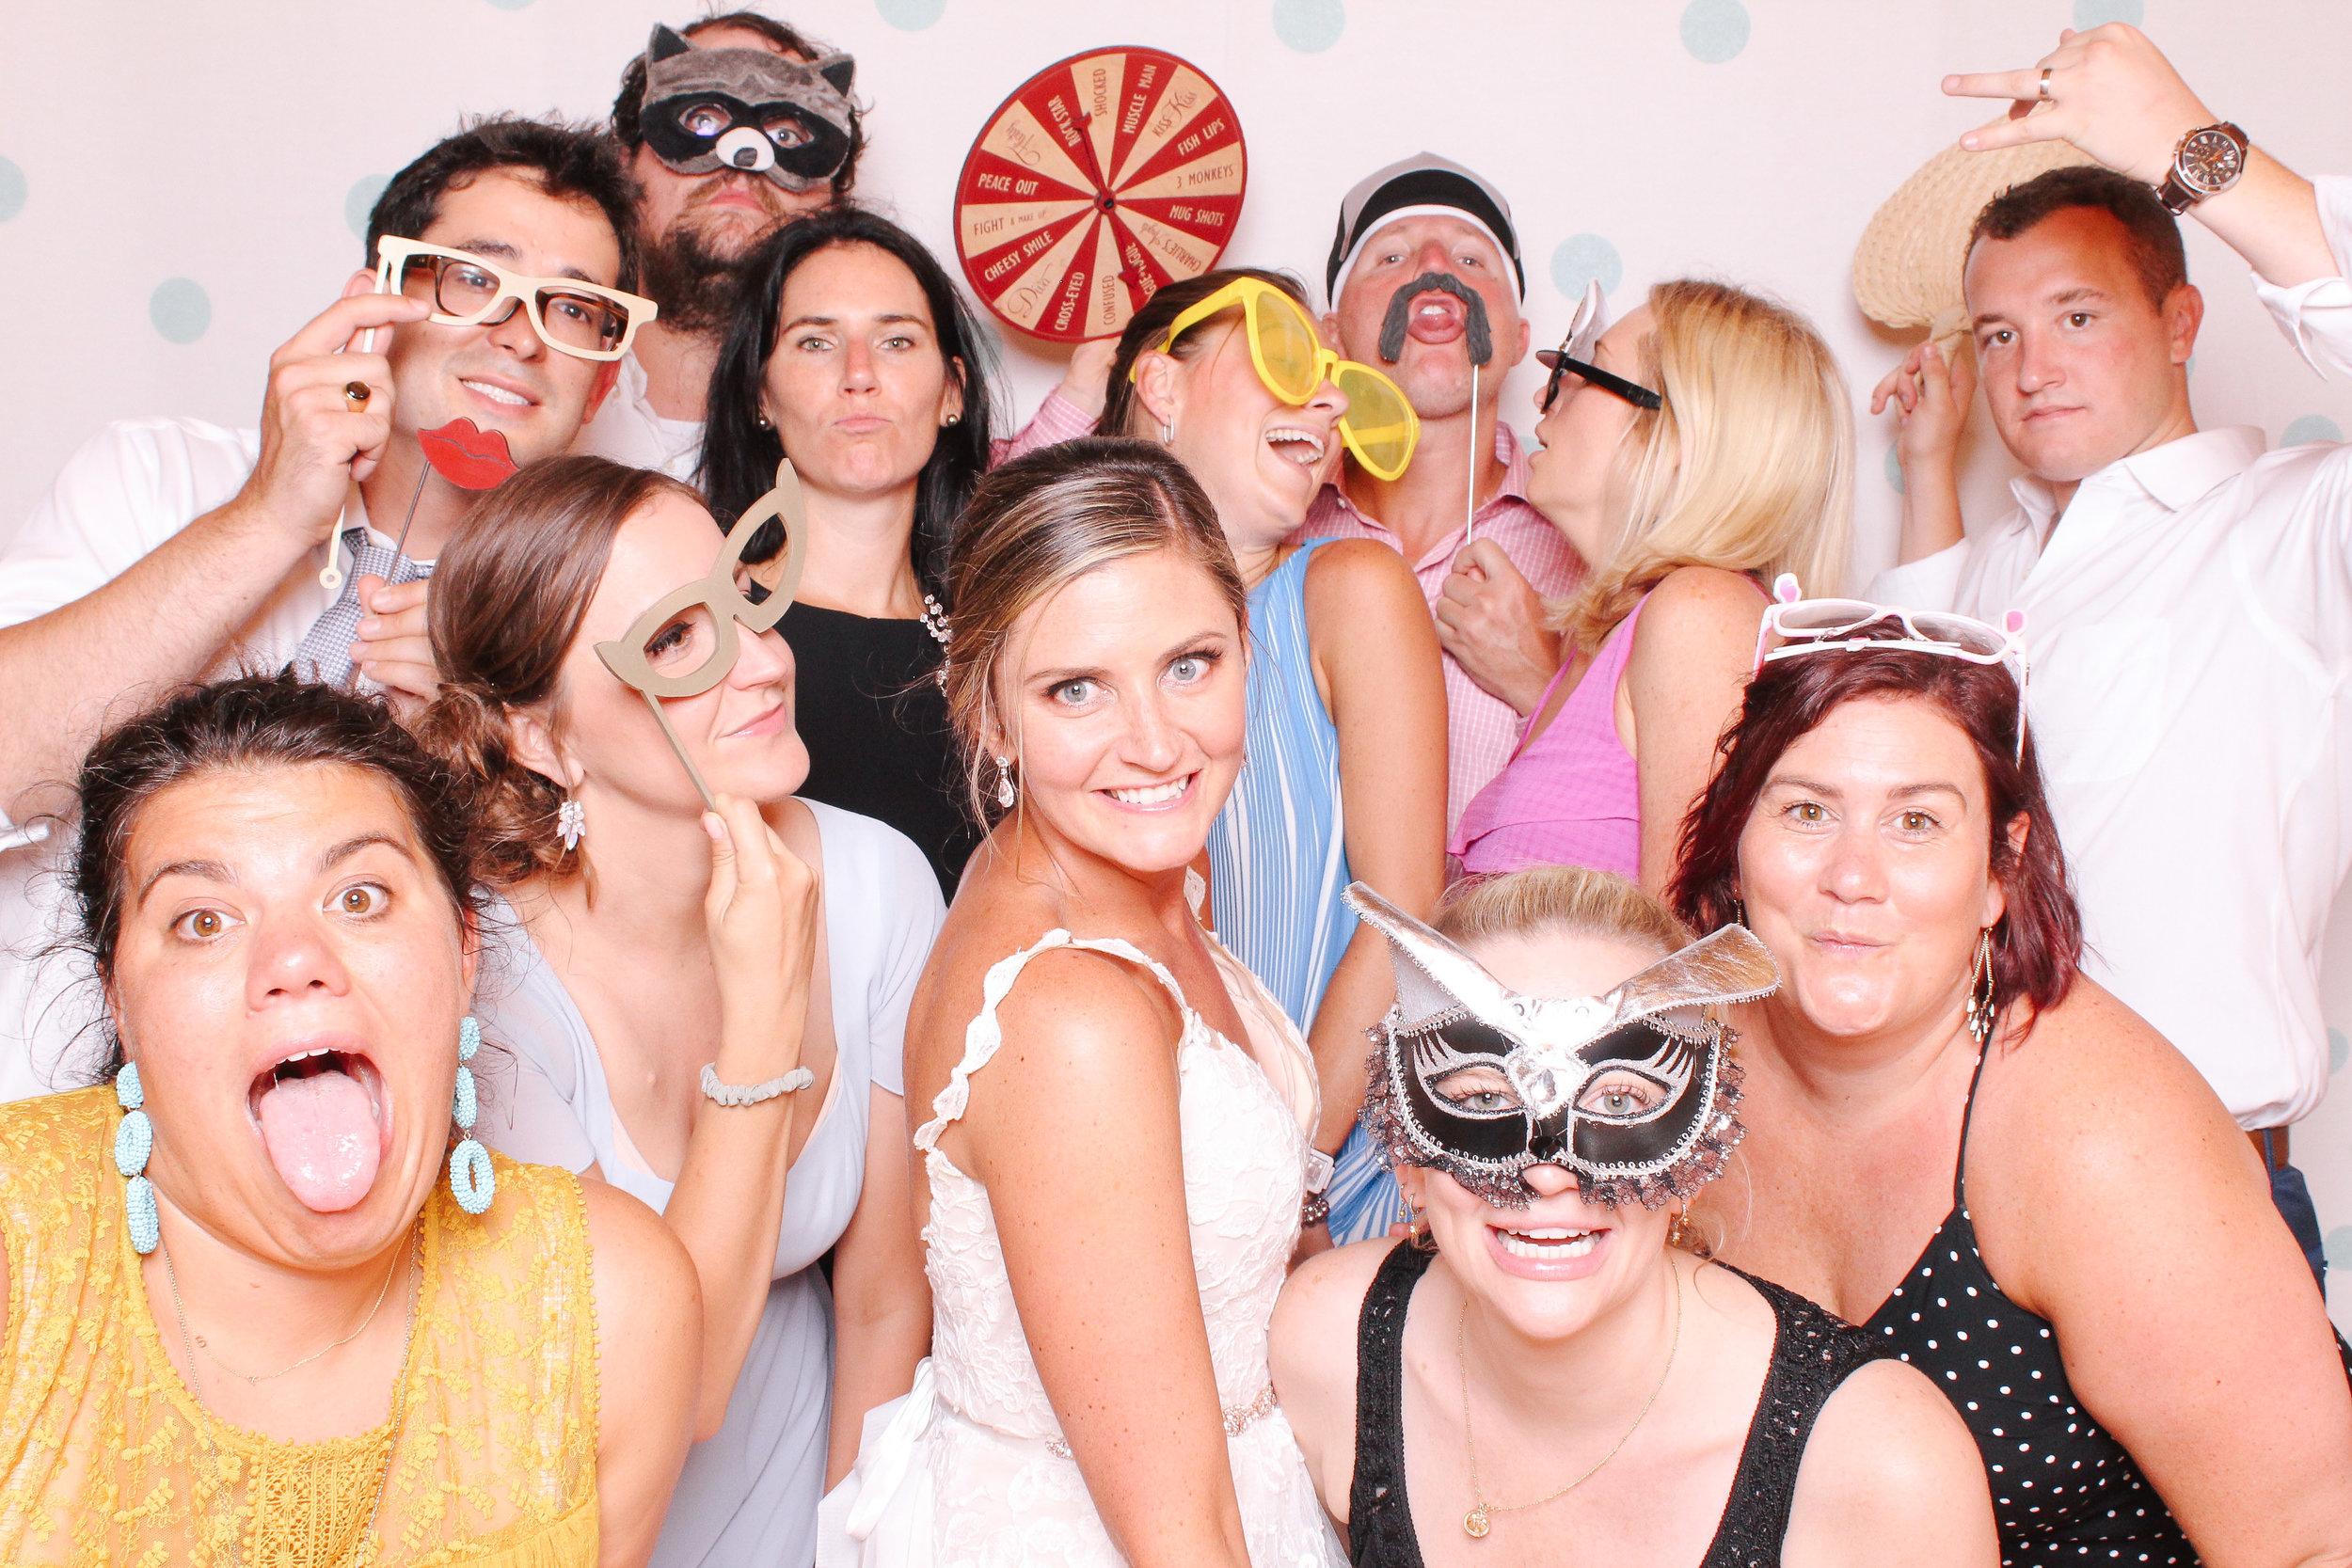 0151 Cleveland Wedding Photobooth too much awesomeness.jpg